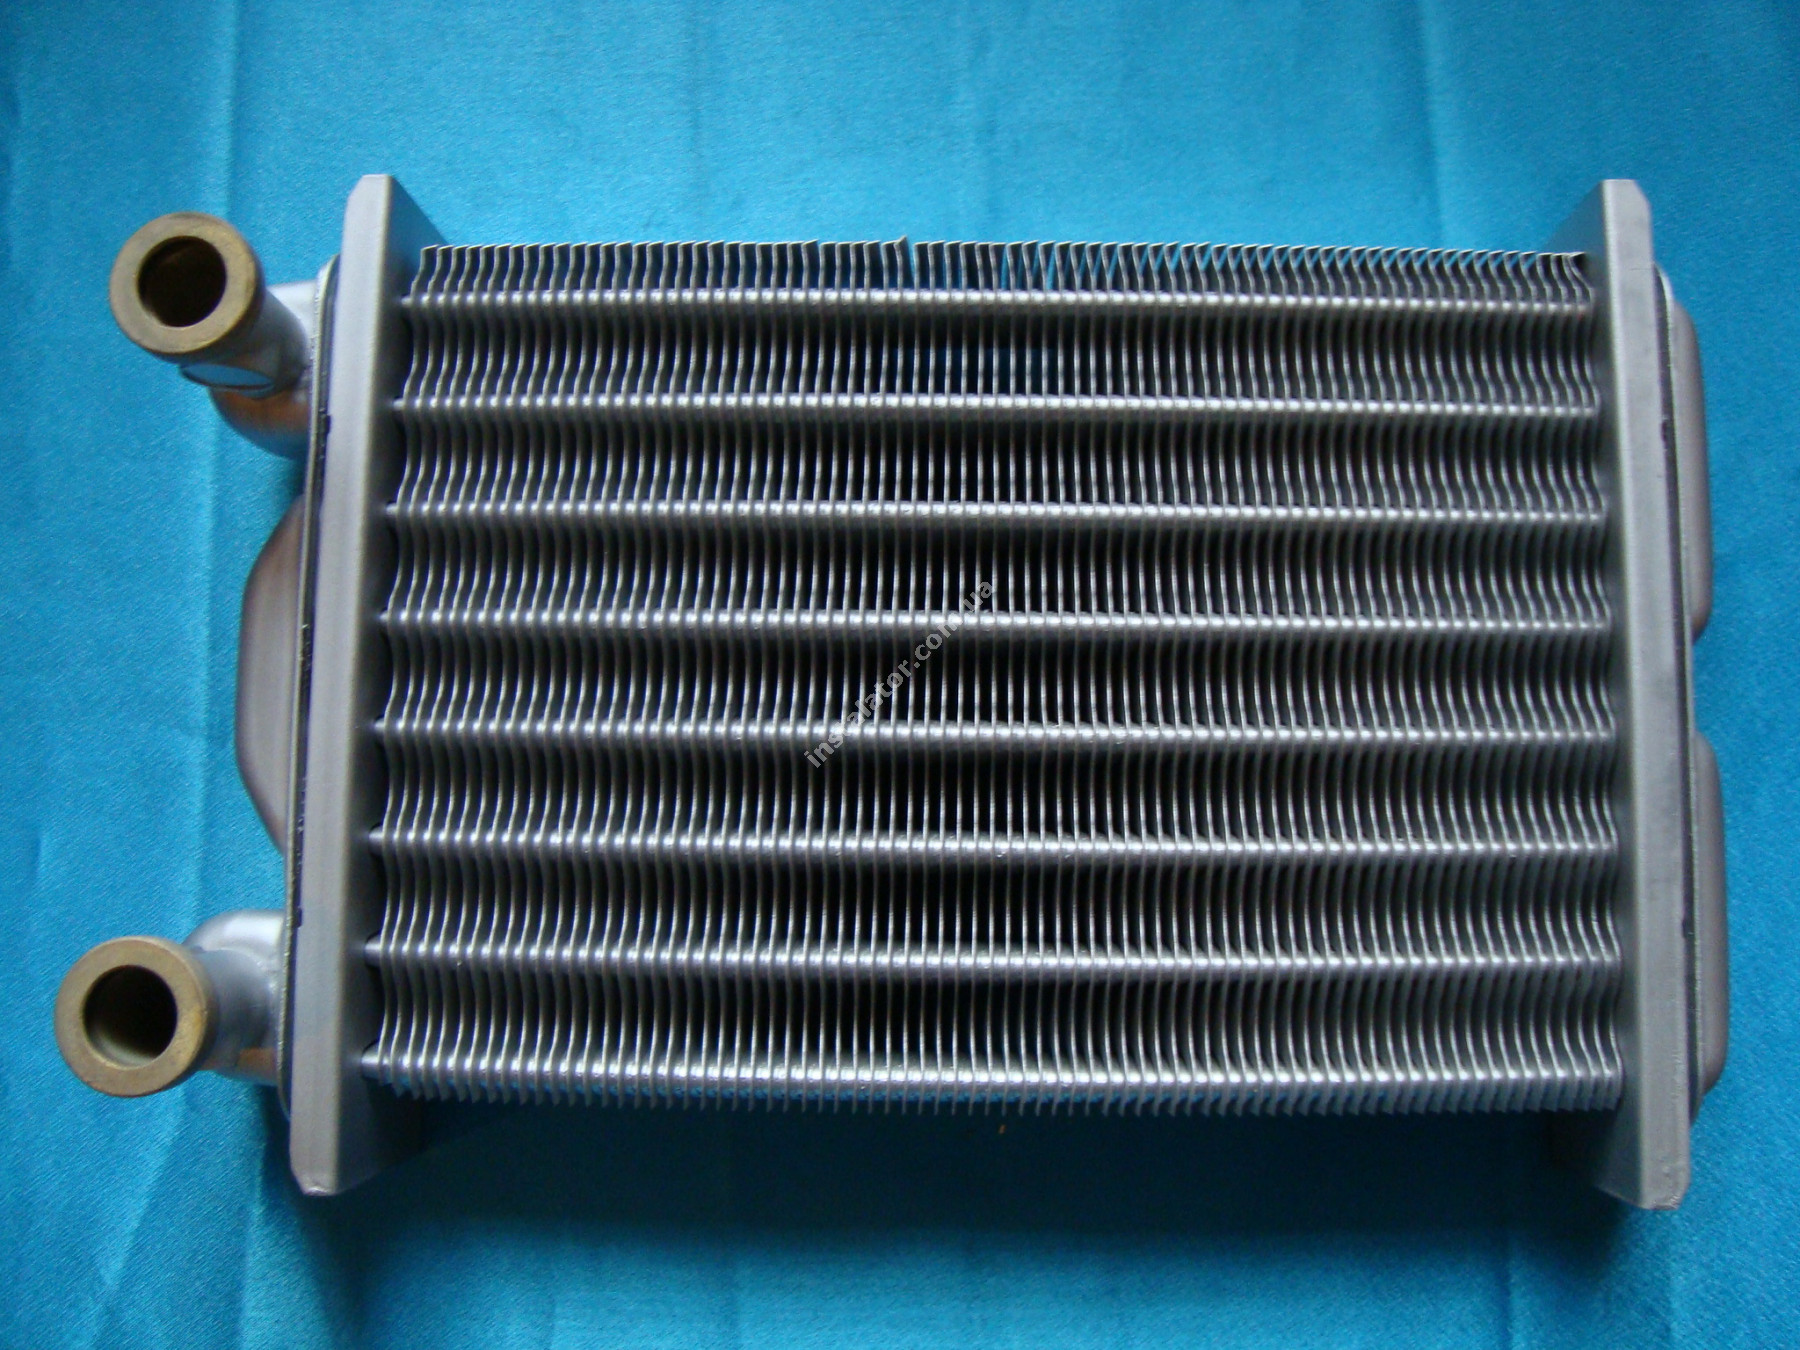 BI1202101 Теплообмінник первинний Biasi Nova Parva, Solar, Control full-image-4